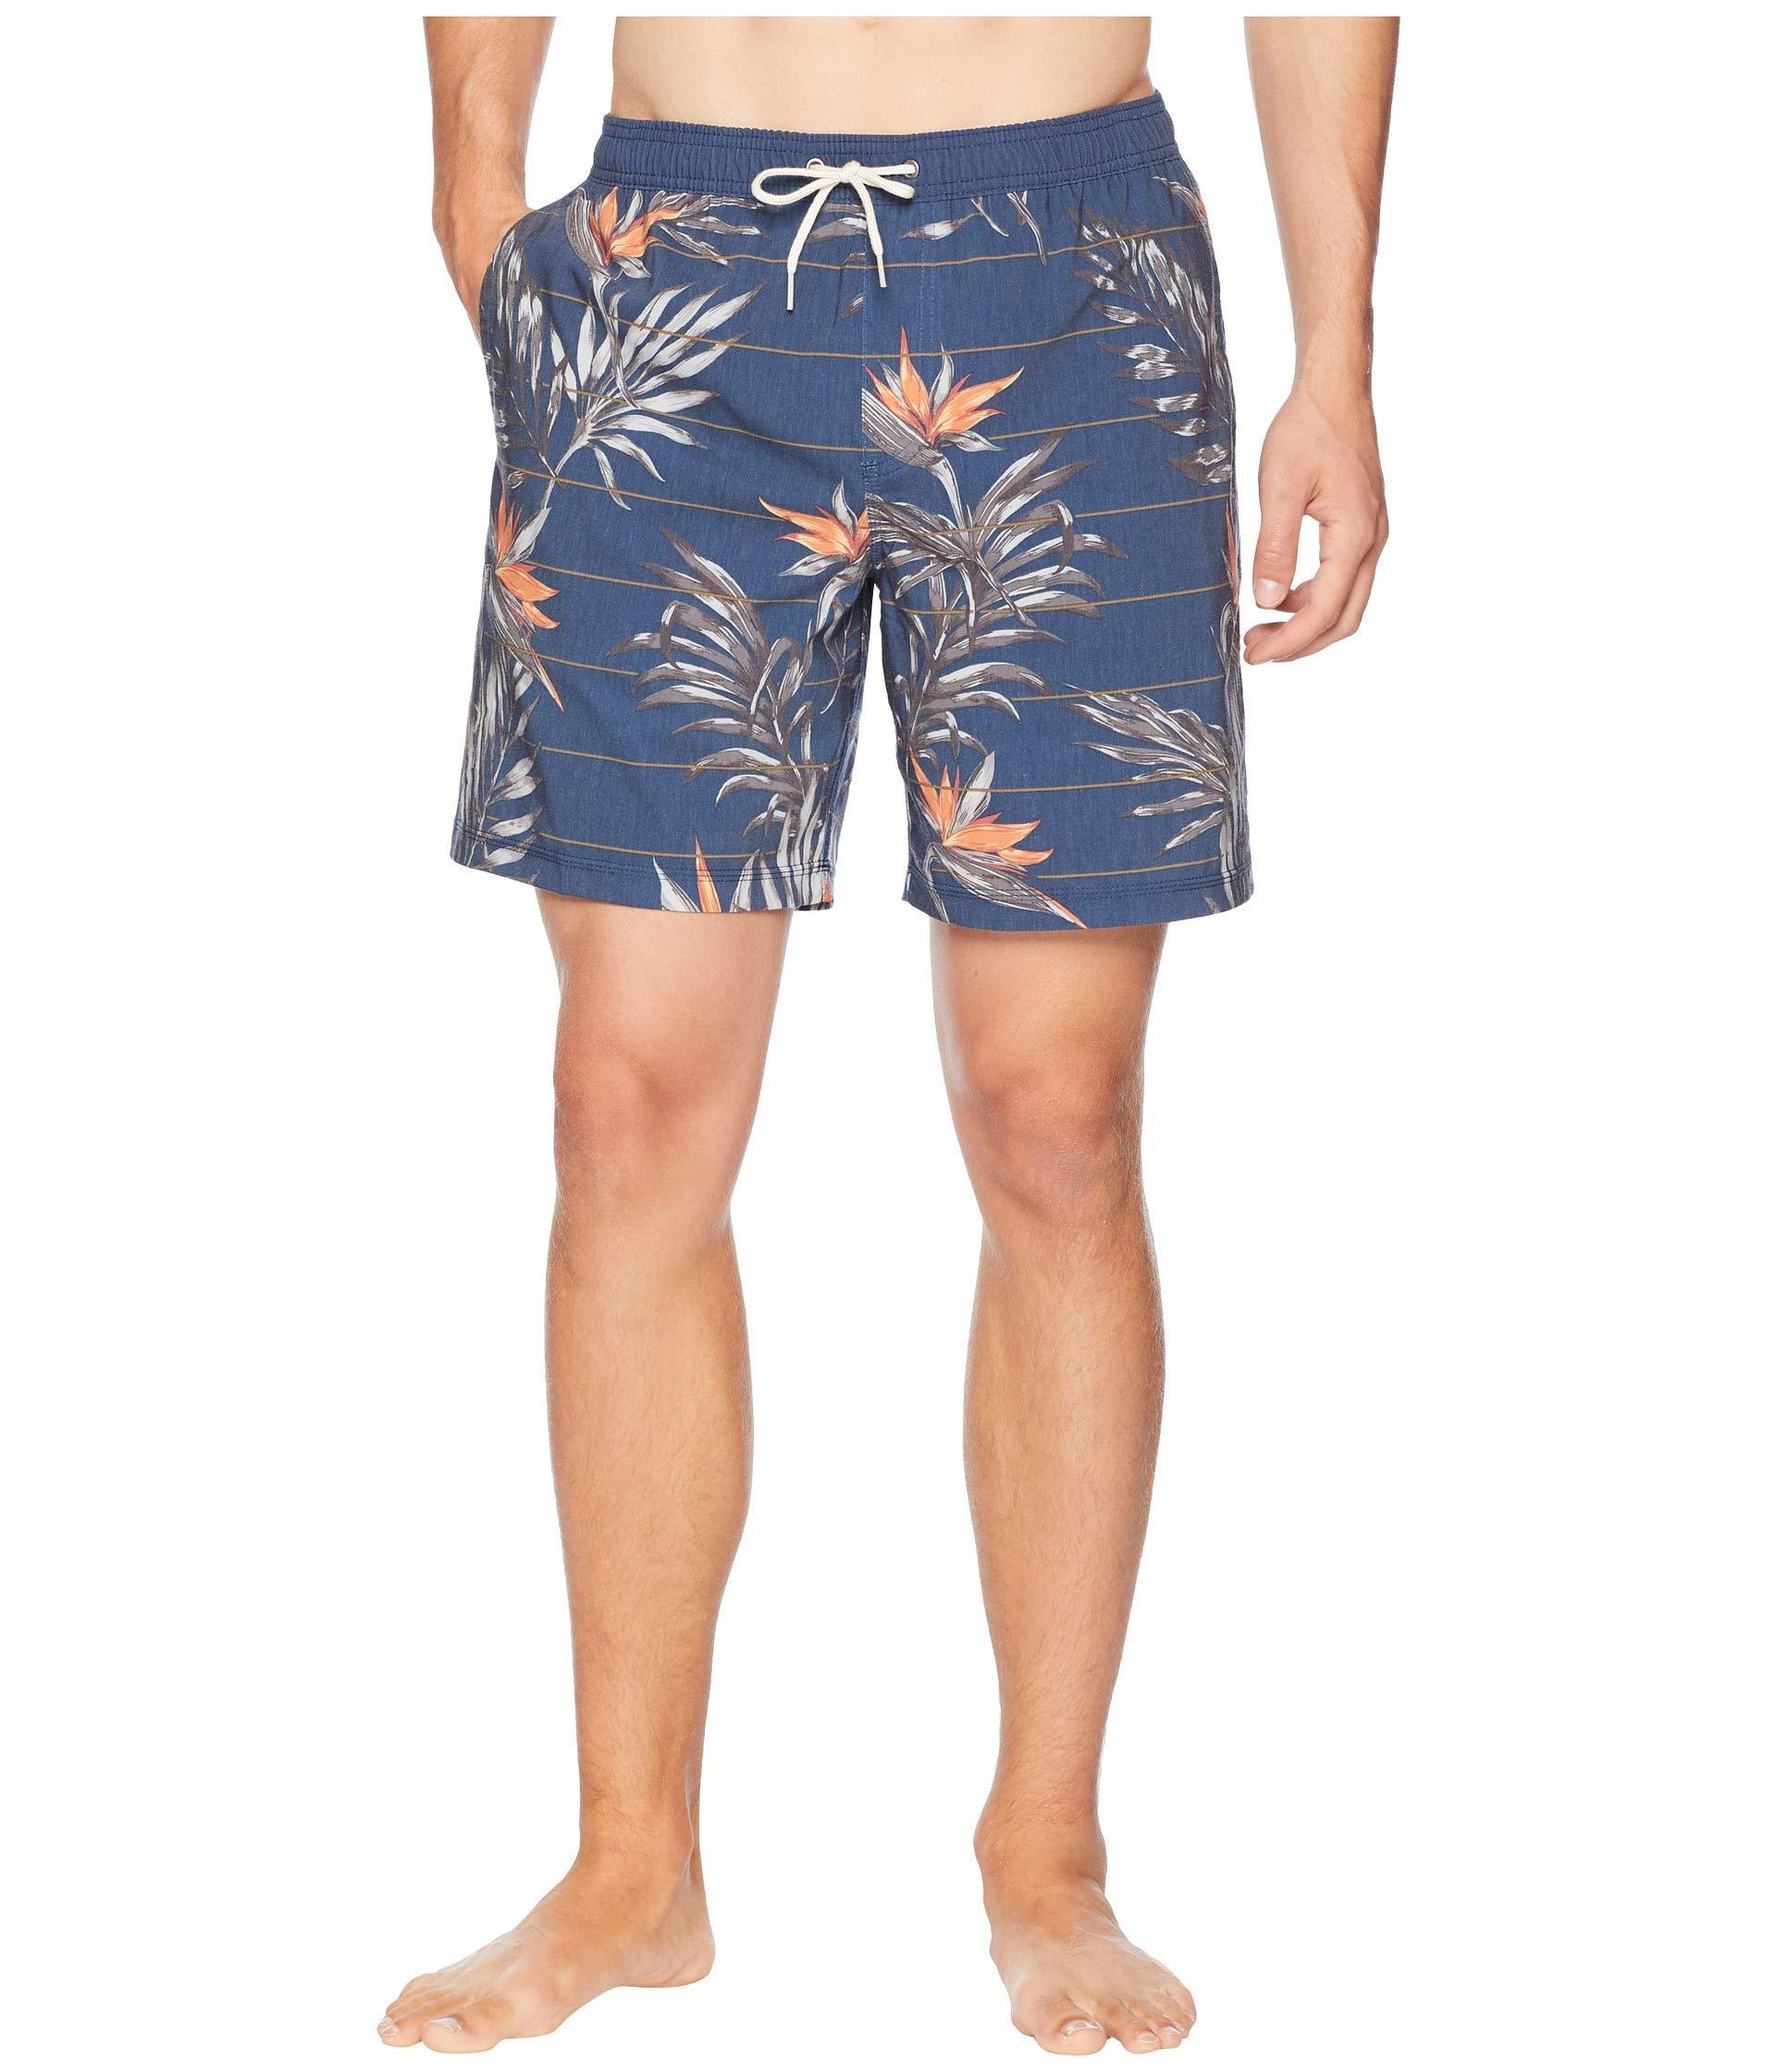 7423f2b153 Lyst - O'neill Sportswear Paradise Volley Boardshorts in Blue for Men